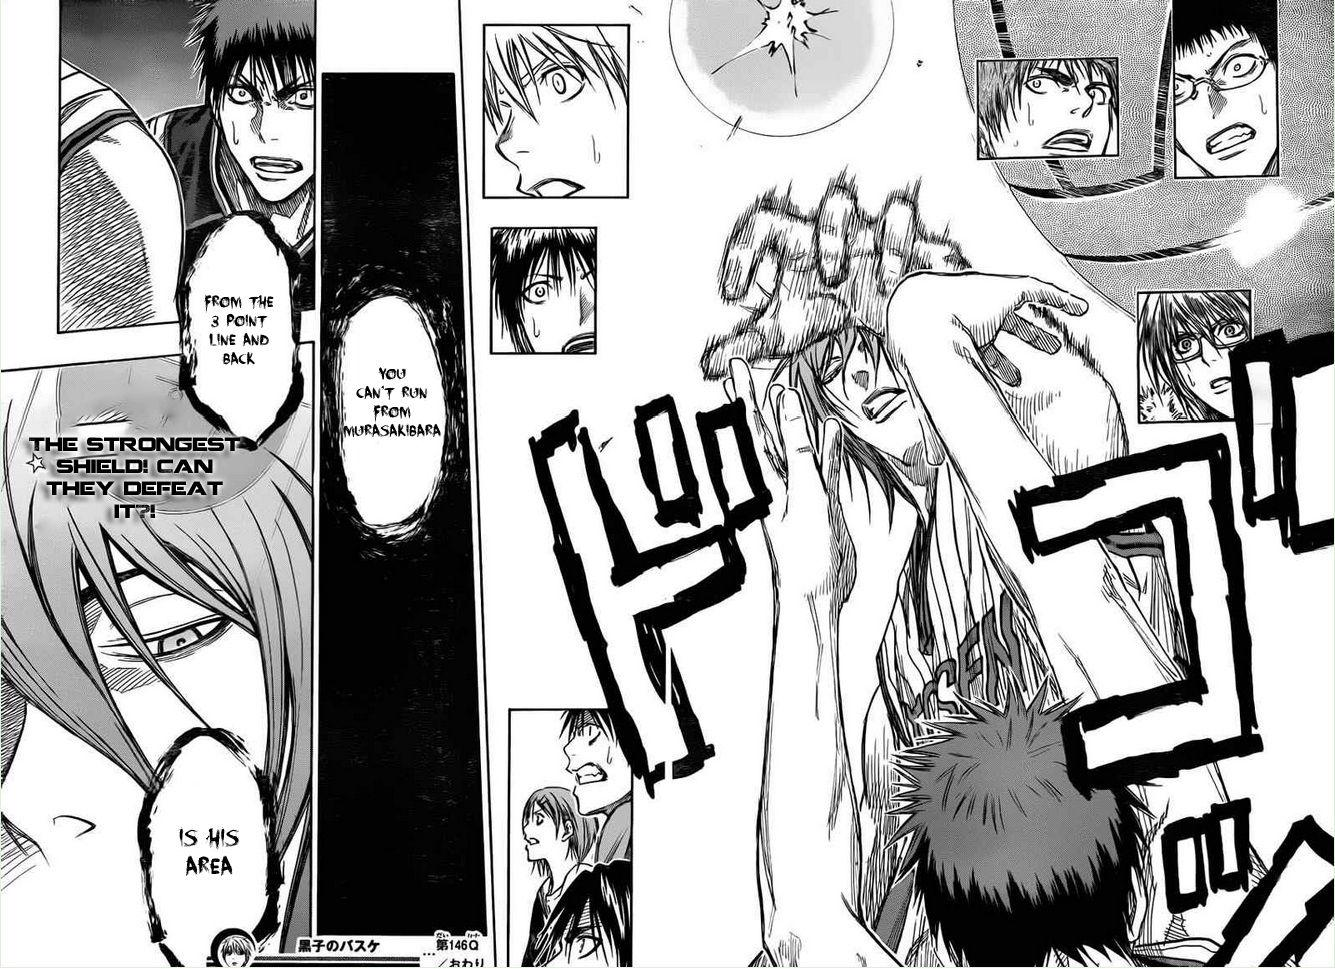 Kuroko no Basket Manga Chapter 146 - Image 17-18